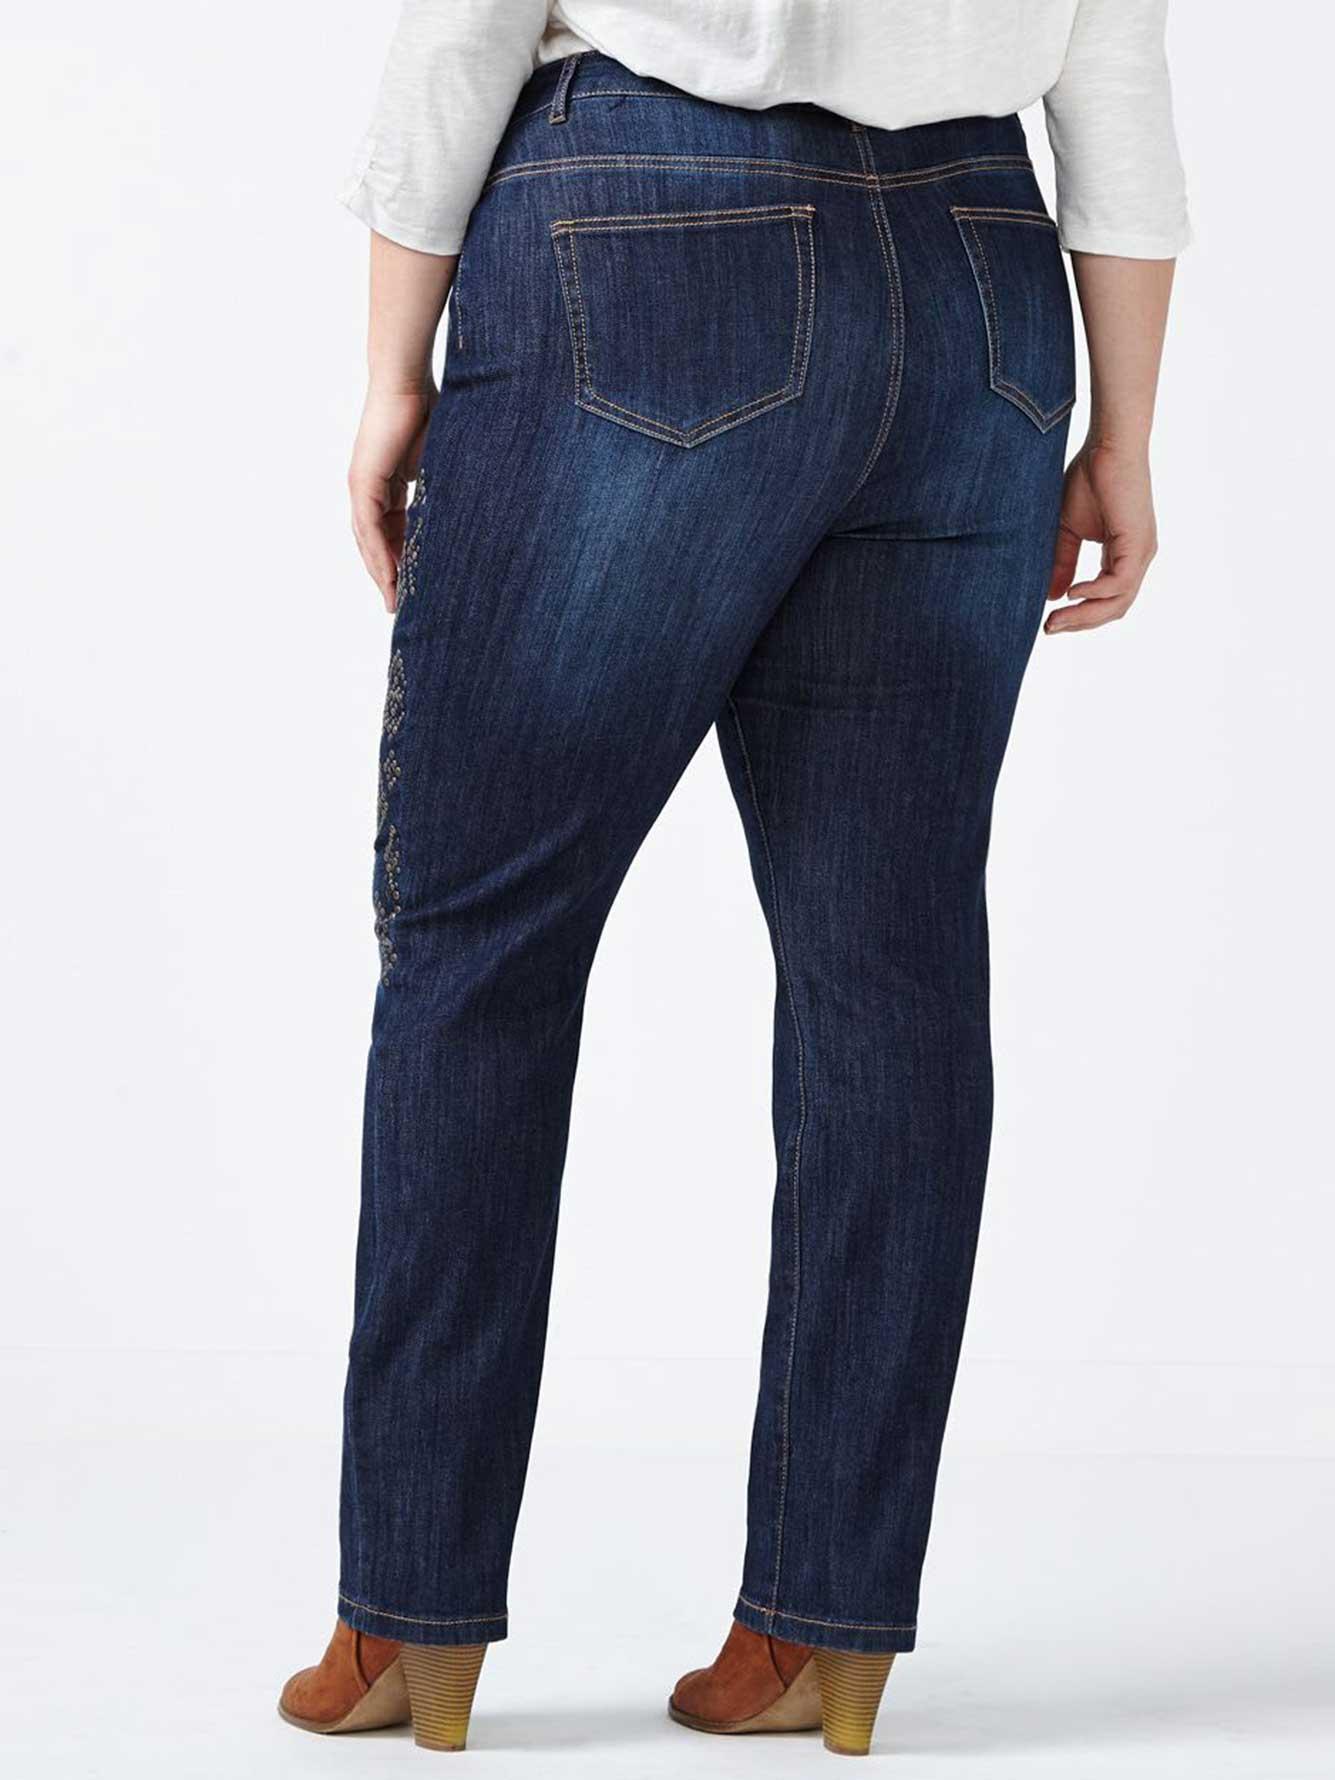 online only d c jeans tall slightly curvy fit straight leg embellished jean penningtons. Black Bedroom Furniture Sets. Home Design Ideas